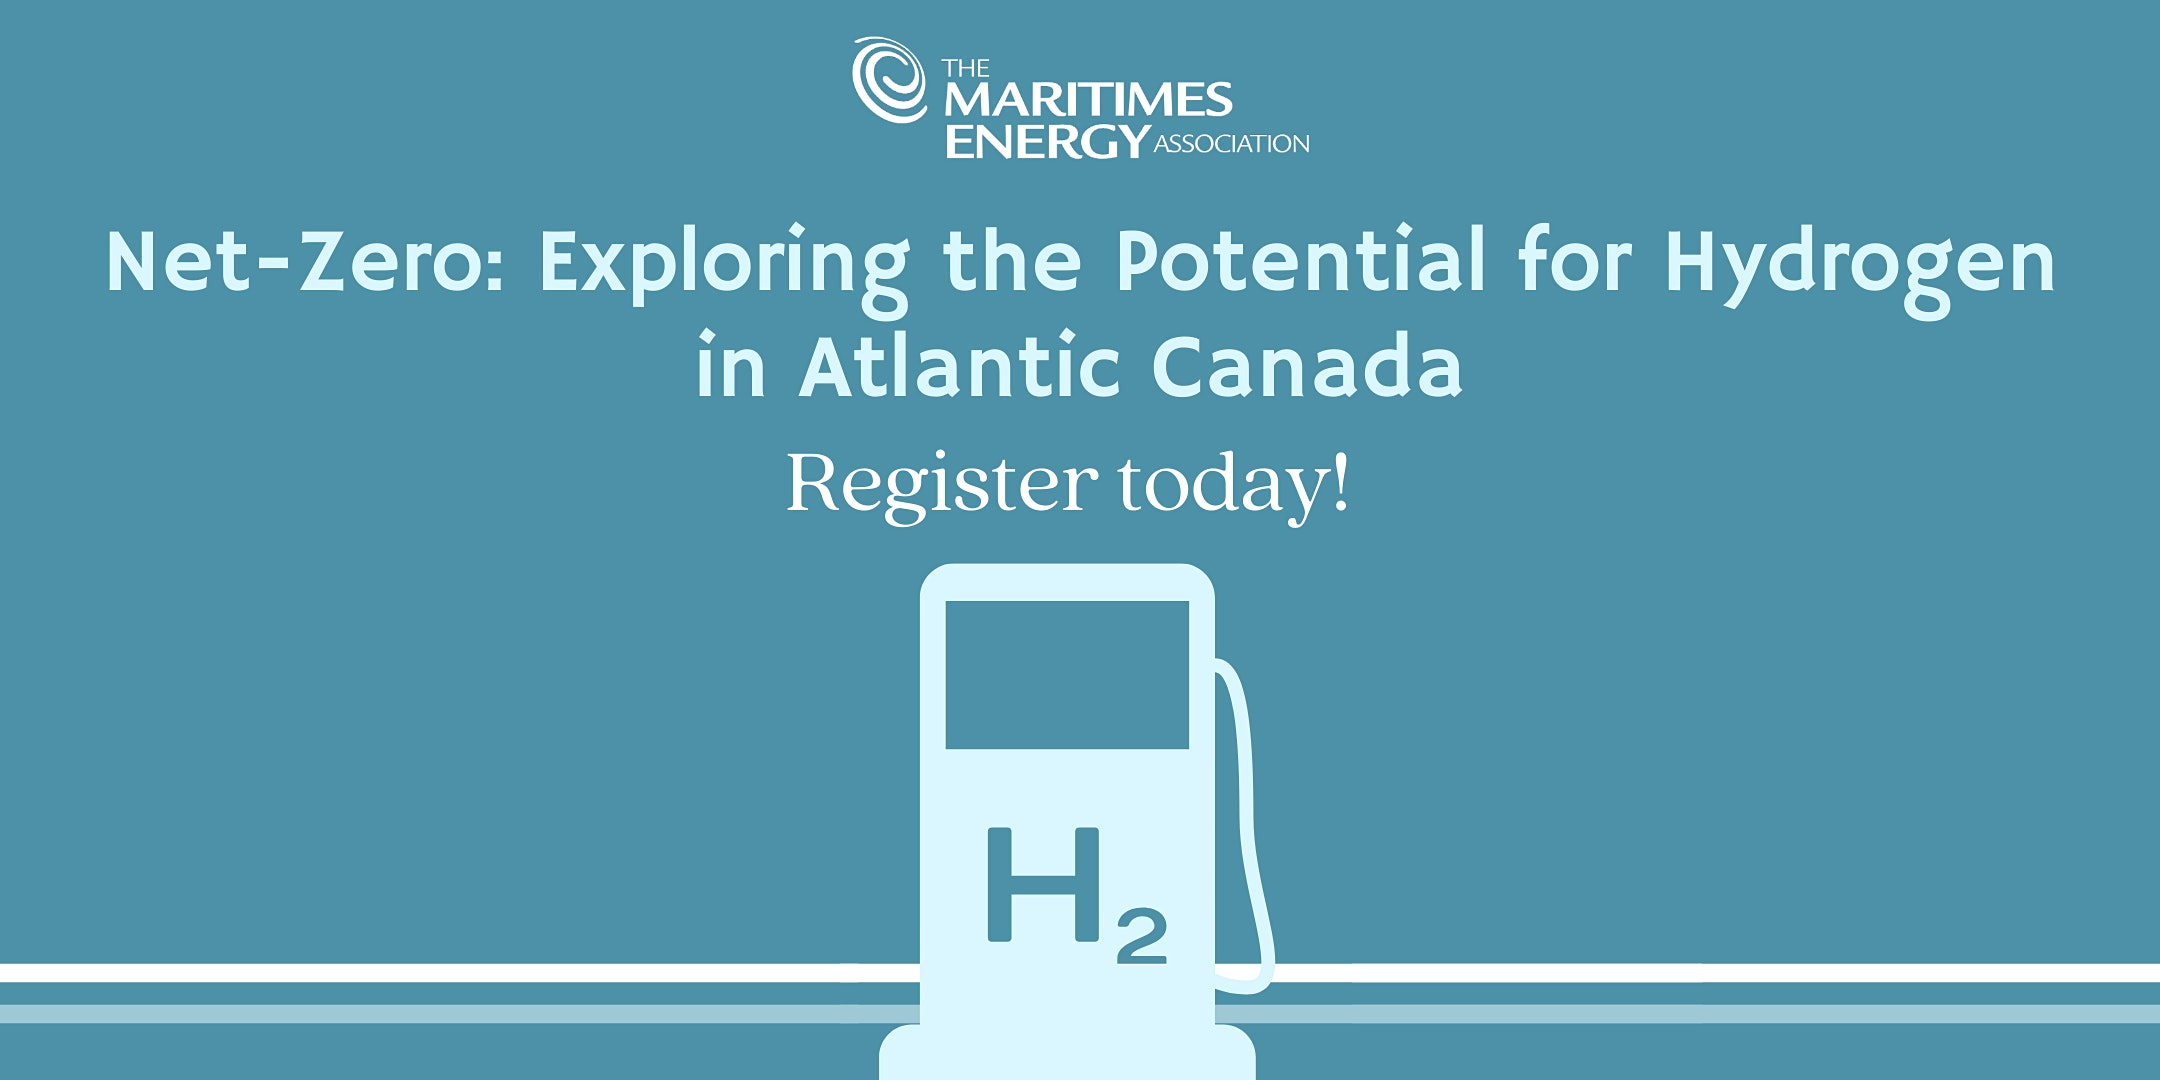 Net-Zero: Exploring the Potential for Hydrogen in Atlantic Canada